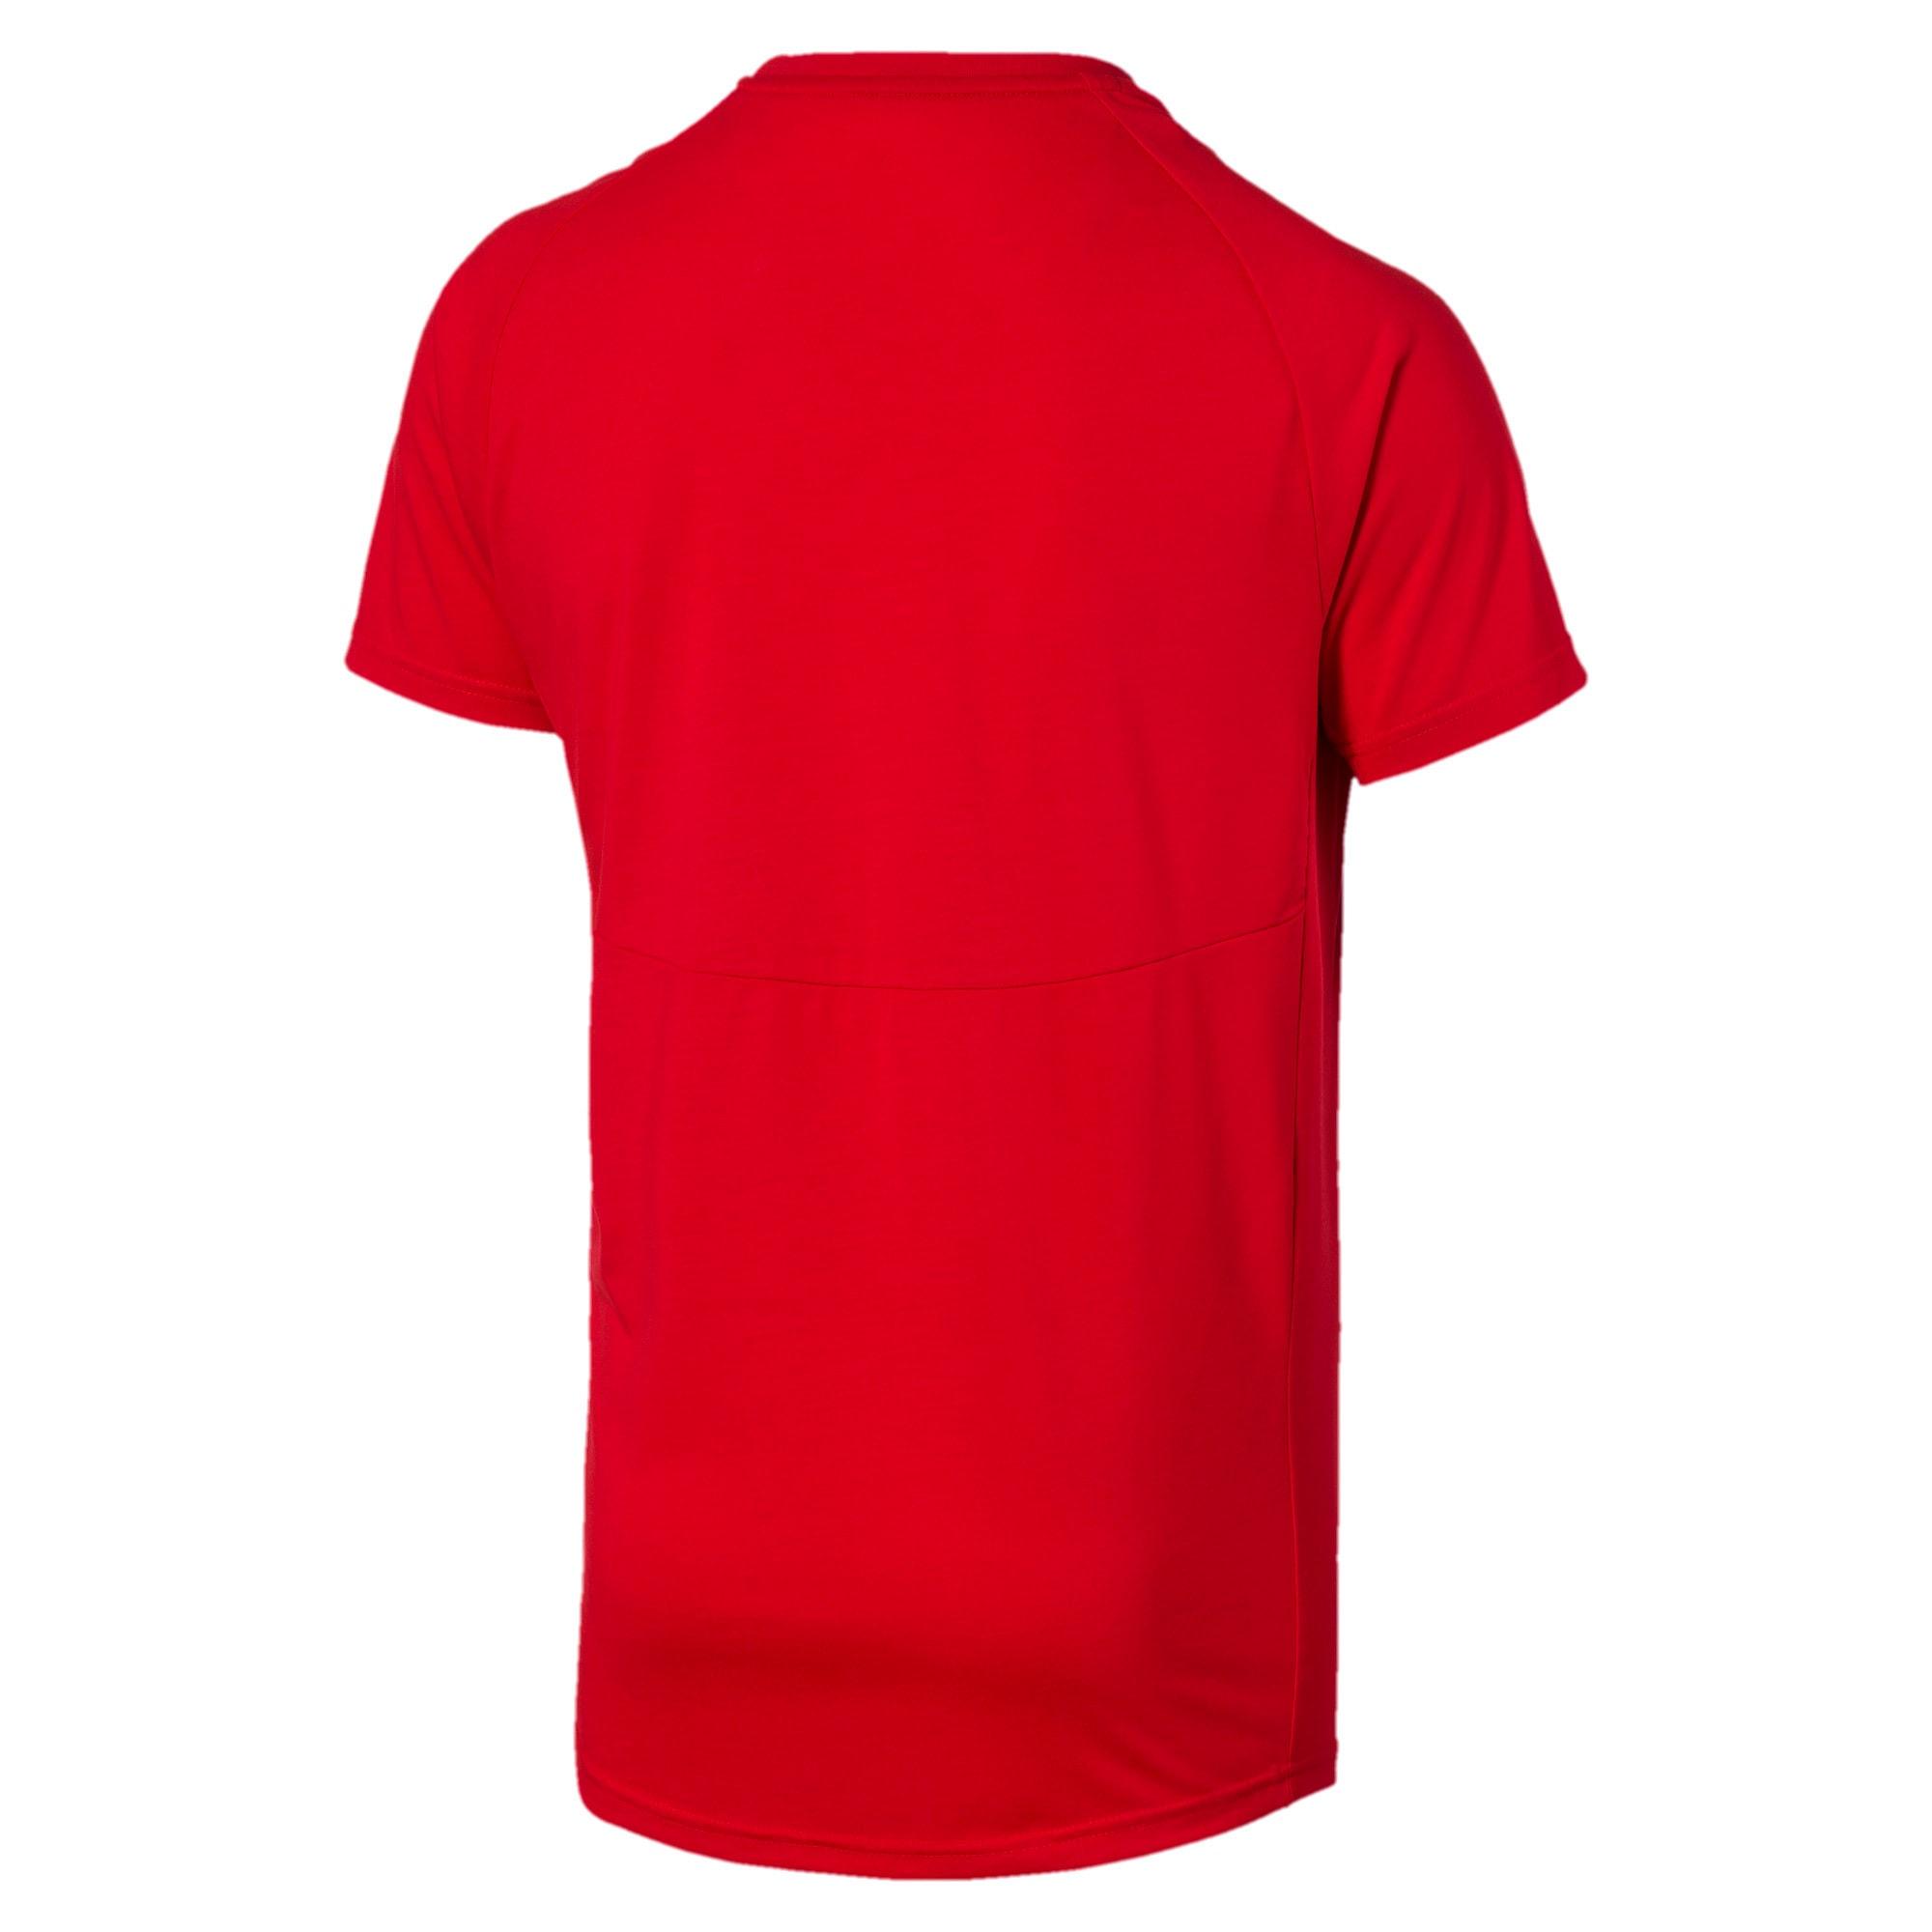 Thumbnail 5 of Meska koszulka z krótkim rekawem Evostripe, High Risk Red, medium